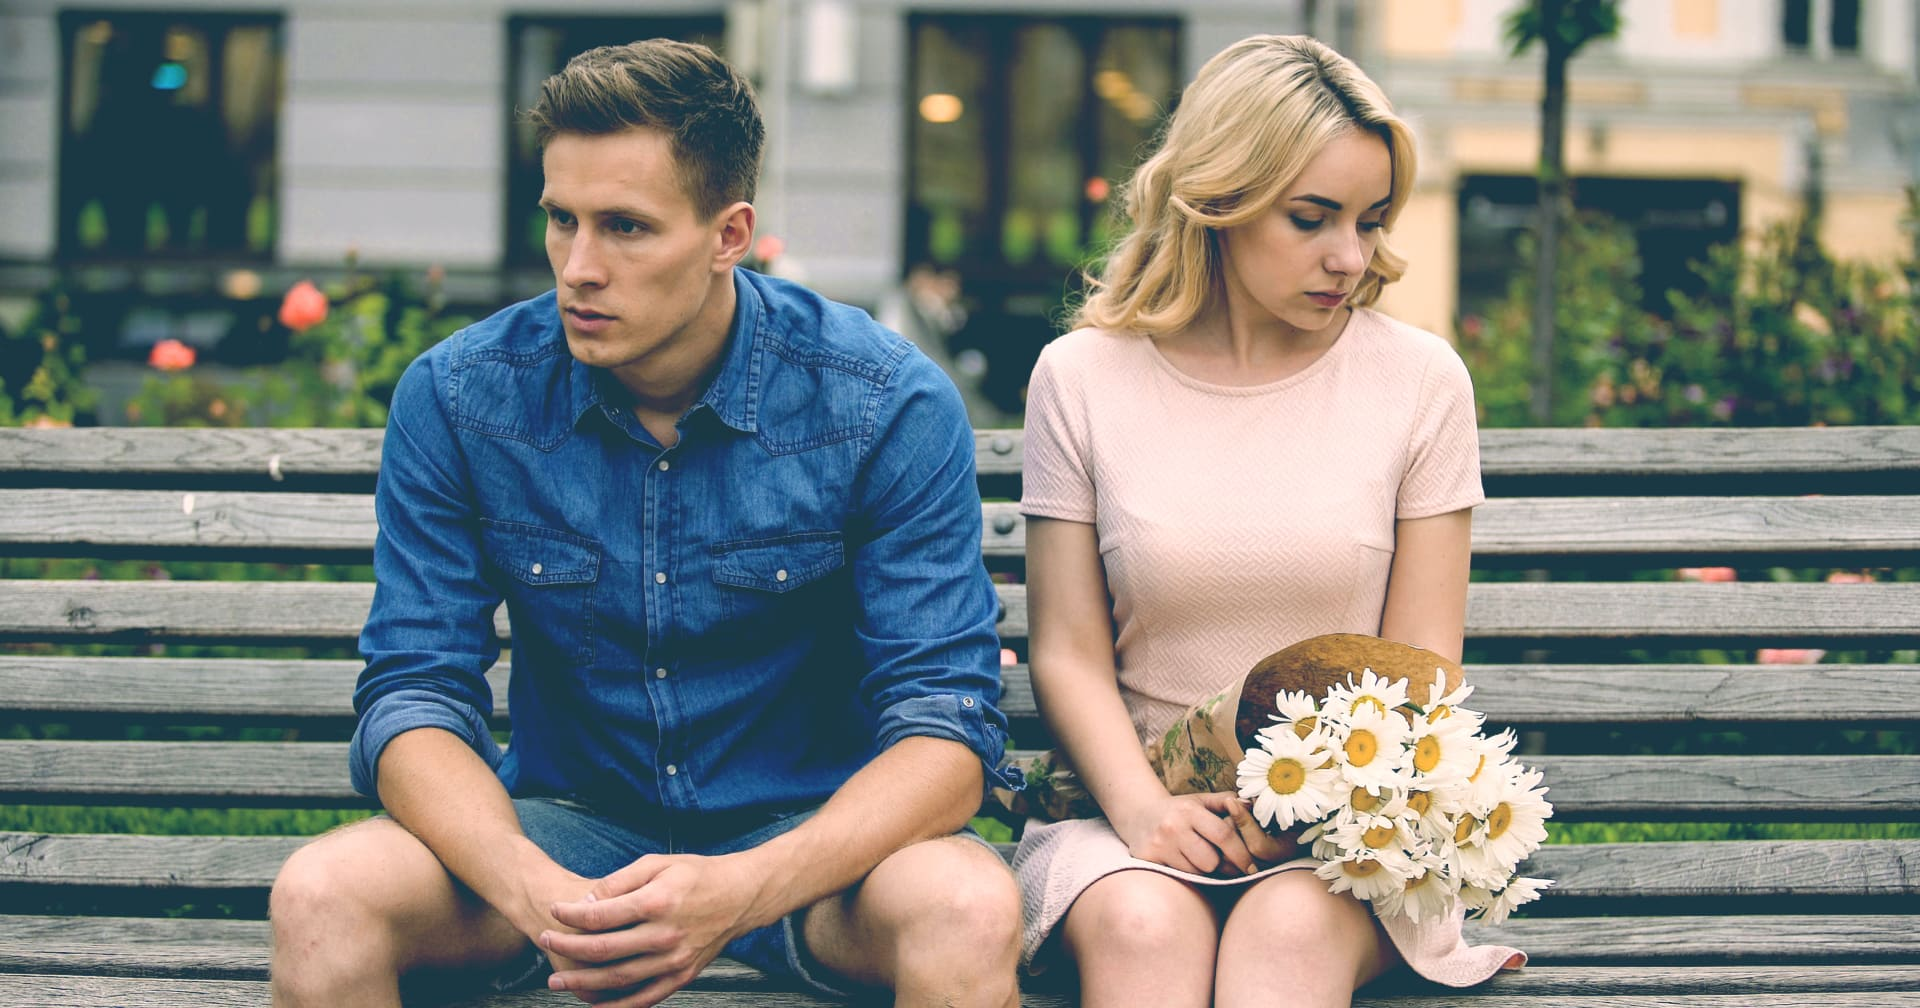 Sinopsis remény randevúk